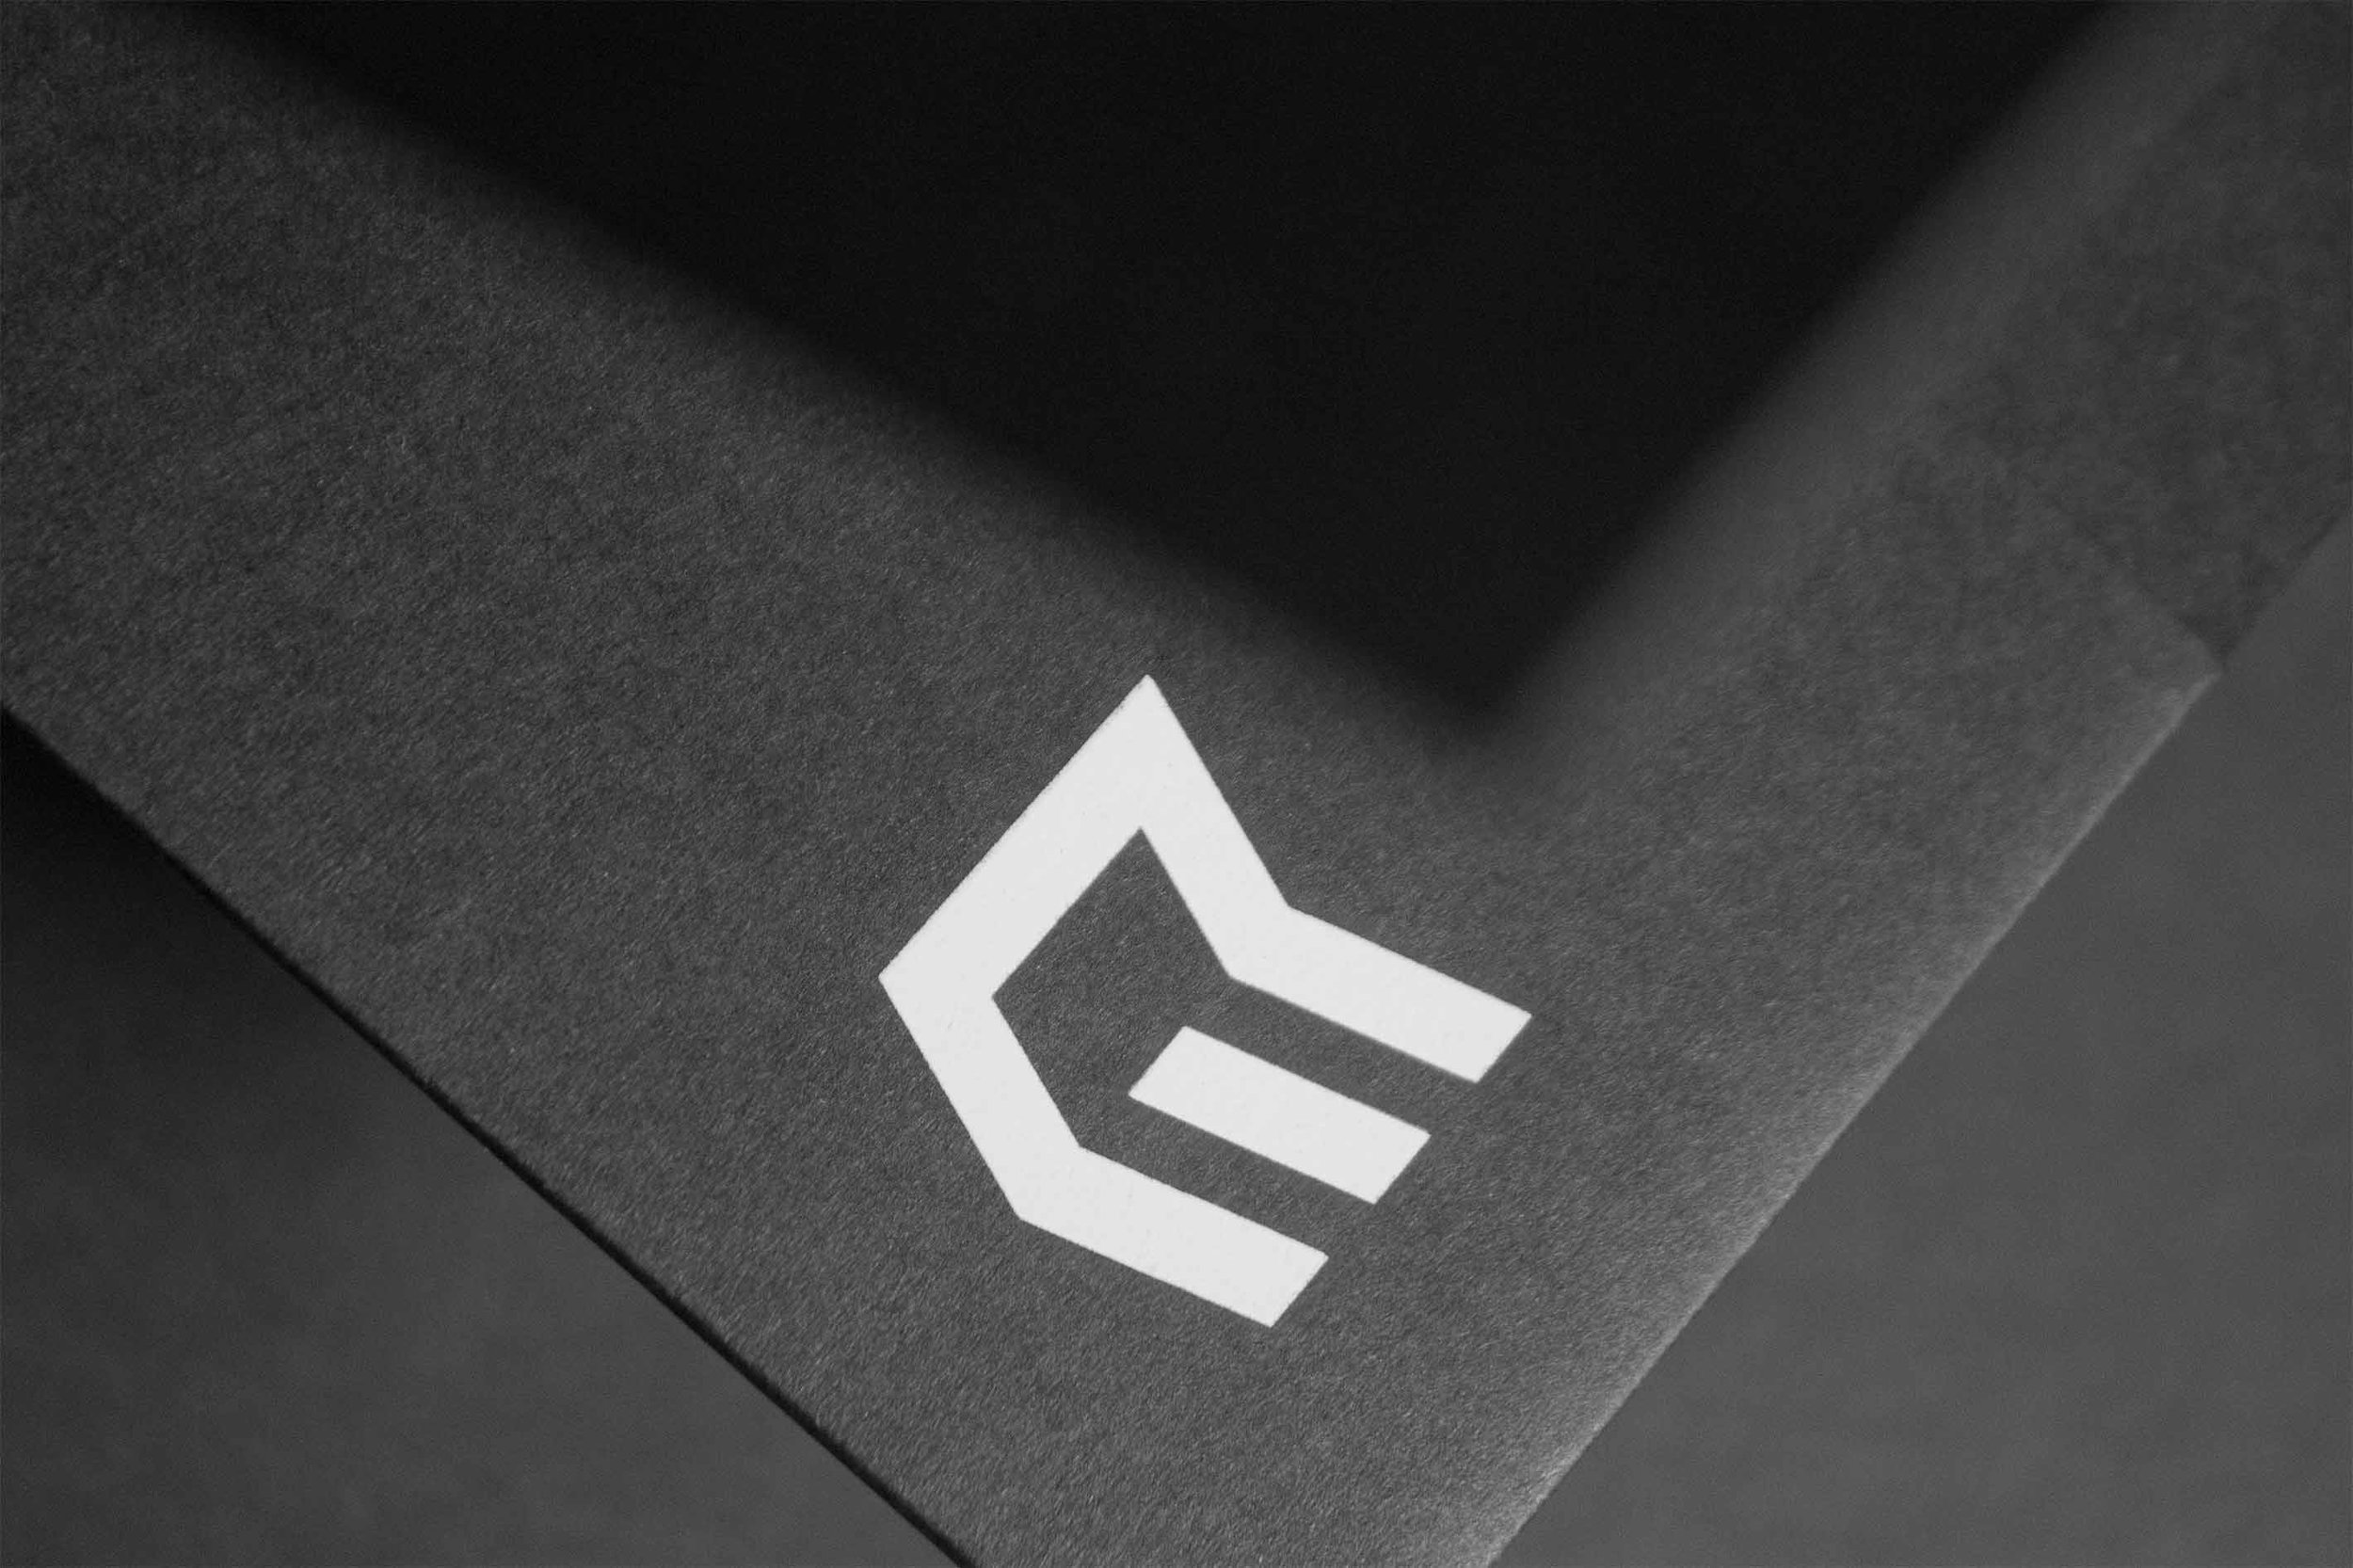 Figure-Jeremy-Hall-Design-Graphique-Quebec-Logo-Branding-Image-De-Marque-Item-Construction-11.jpg